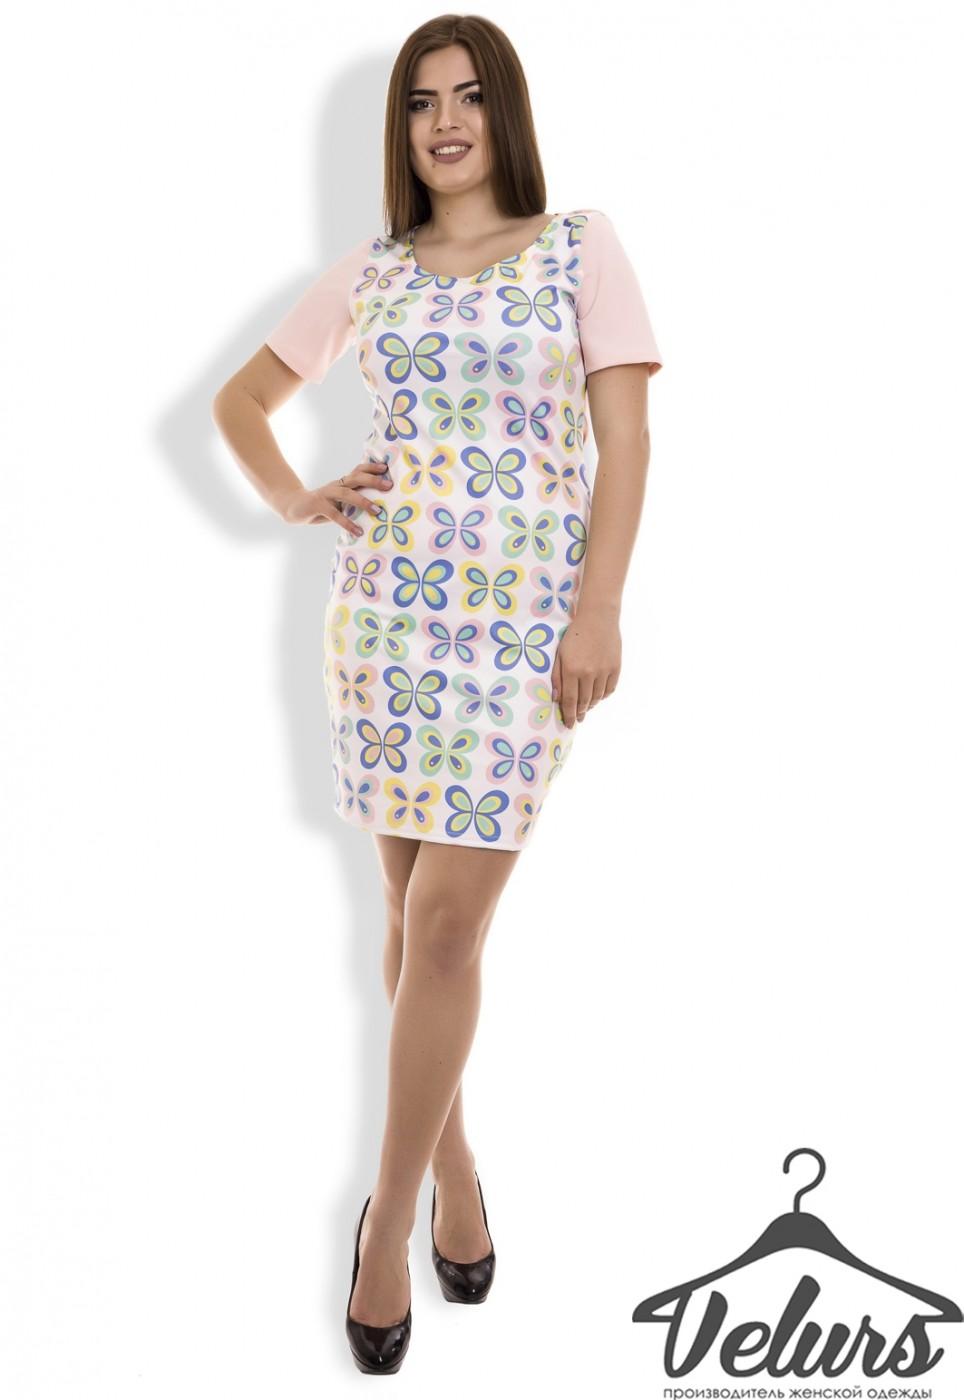 Velurs: Платье 212108 - фото 4